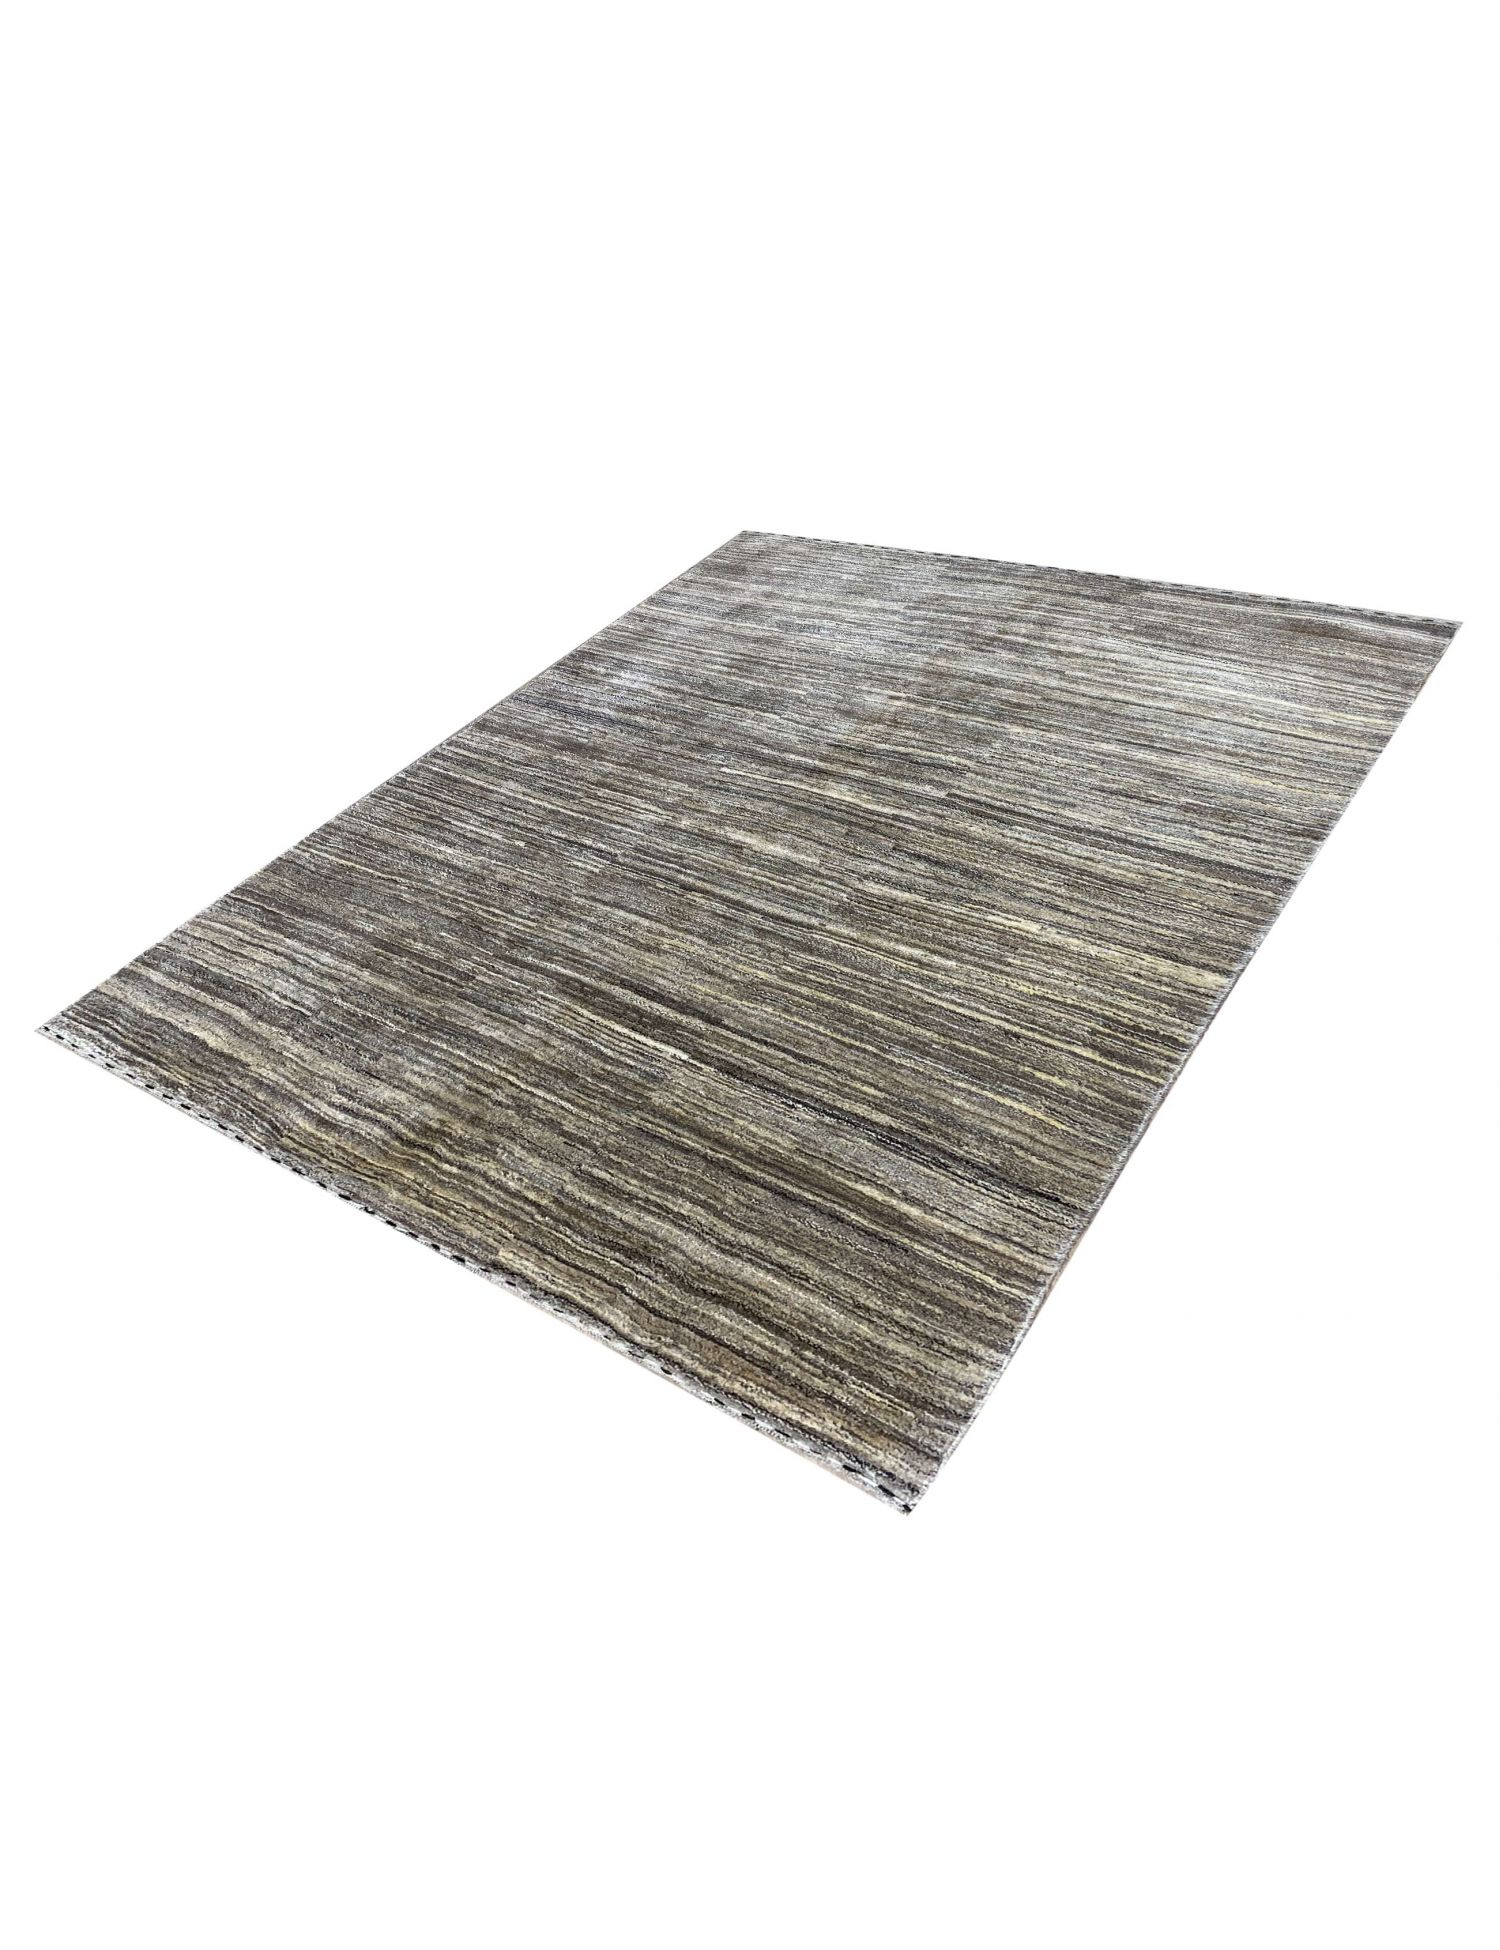 Moderne Teppiche  grau <br/>196 x 150 cm